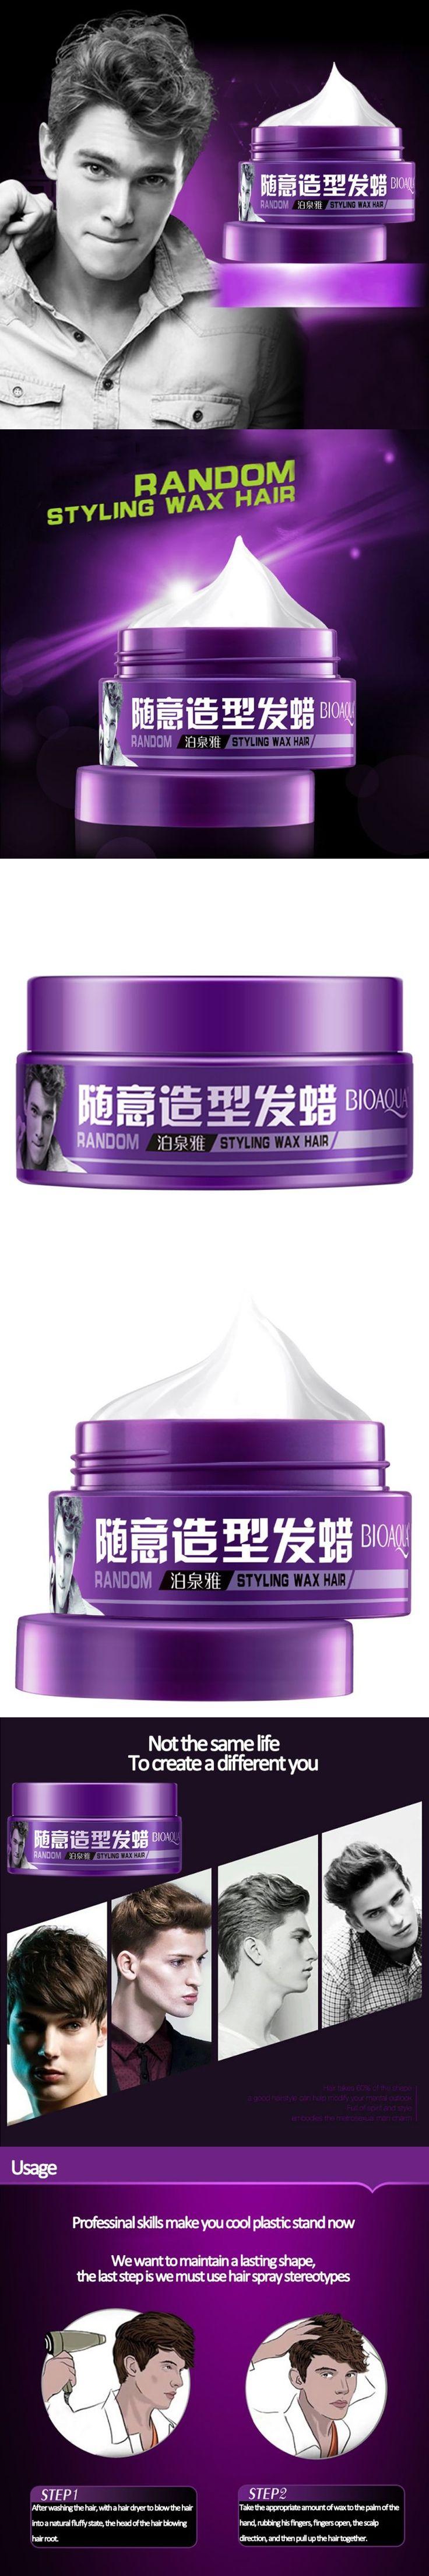 Men Pomades Wax Salon Hair Model Mud Fast Drying Long-lasting Random Style Waxes Beauty